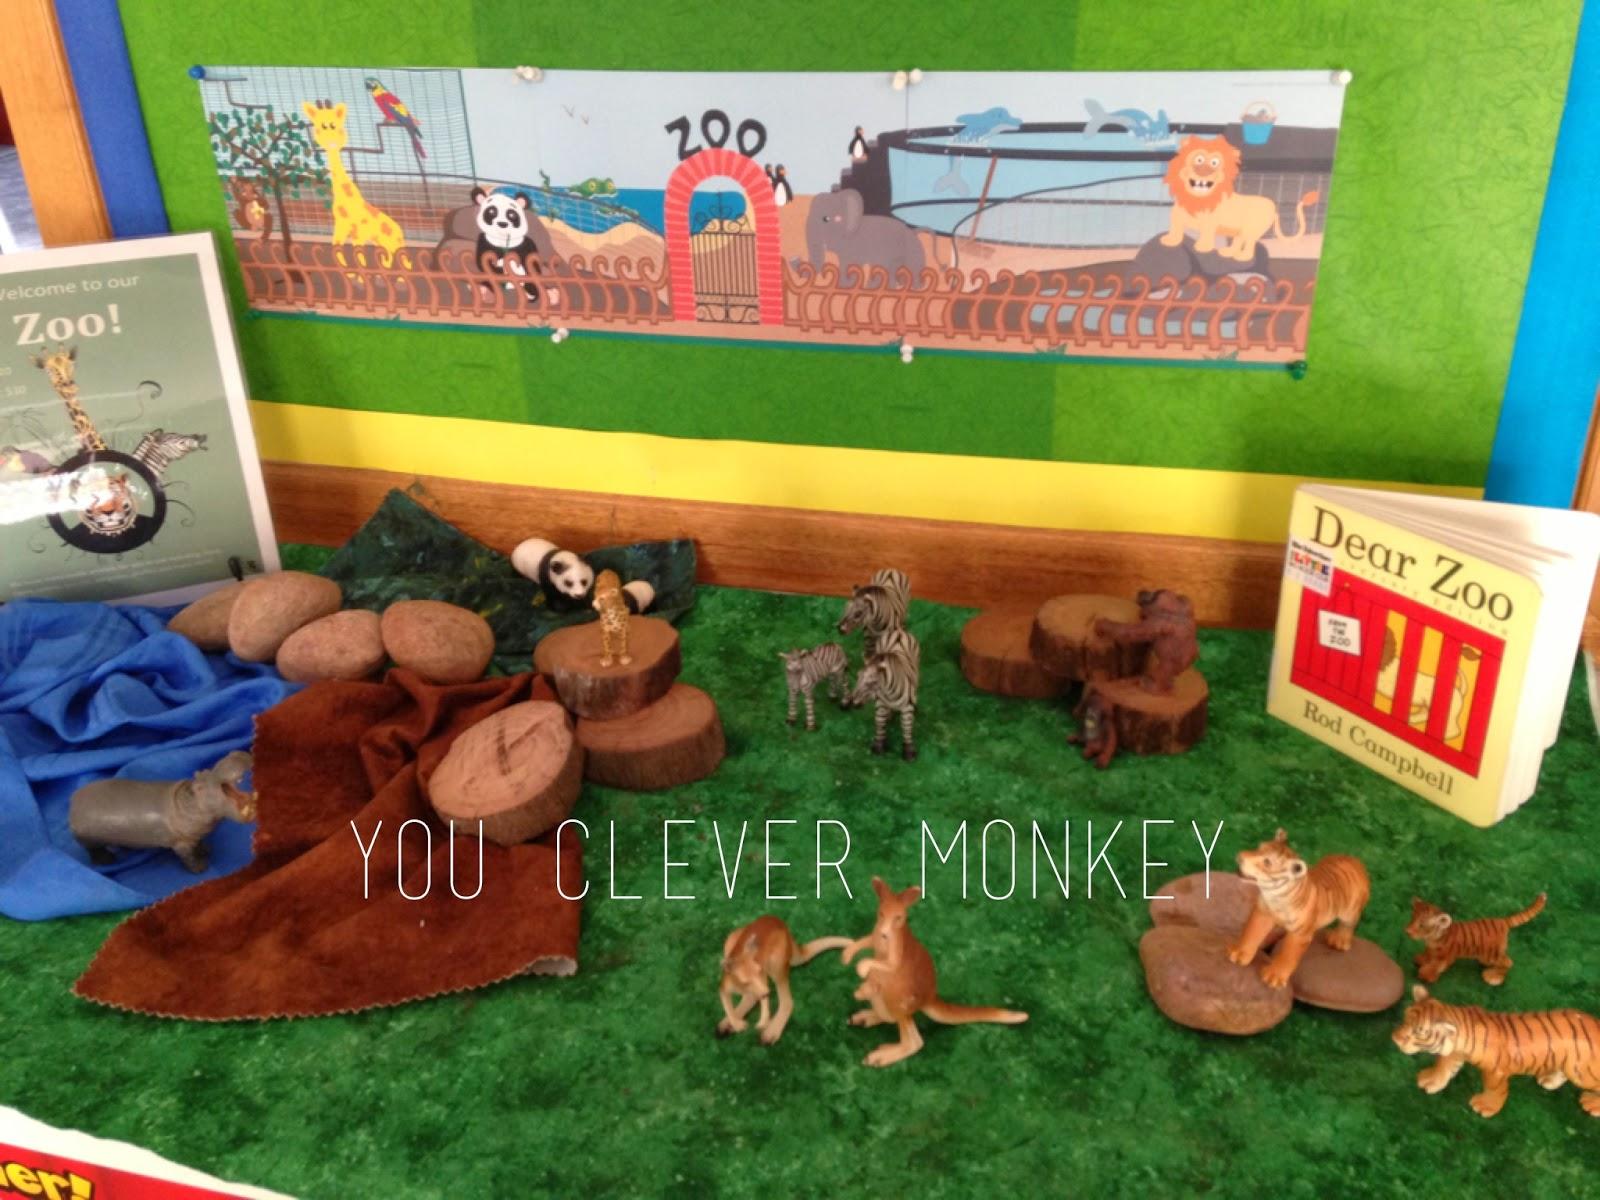 You Clever Monkey Dear Zoo